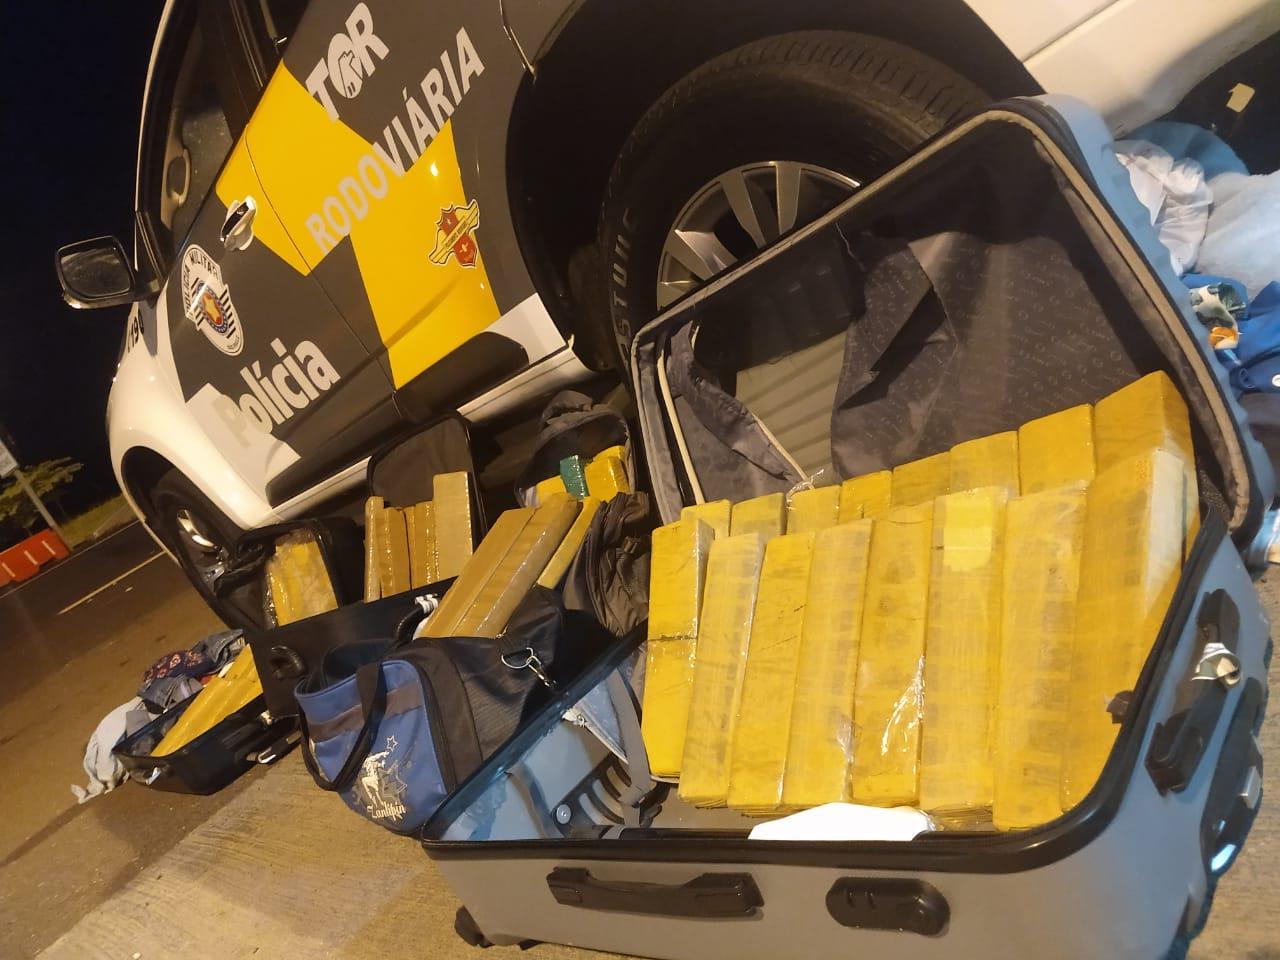 Polícia Militar Rodoviária - Droga apreendida totalizou 28,331 kg.